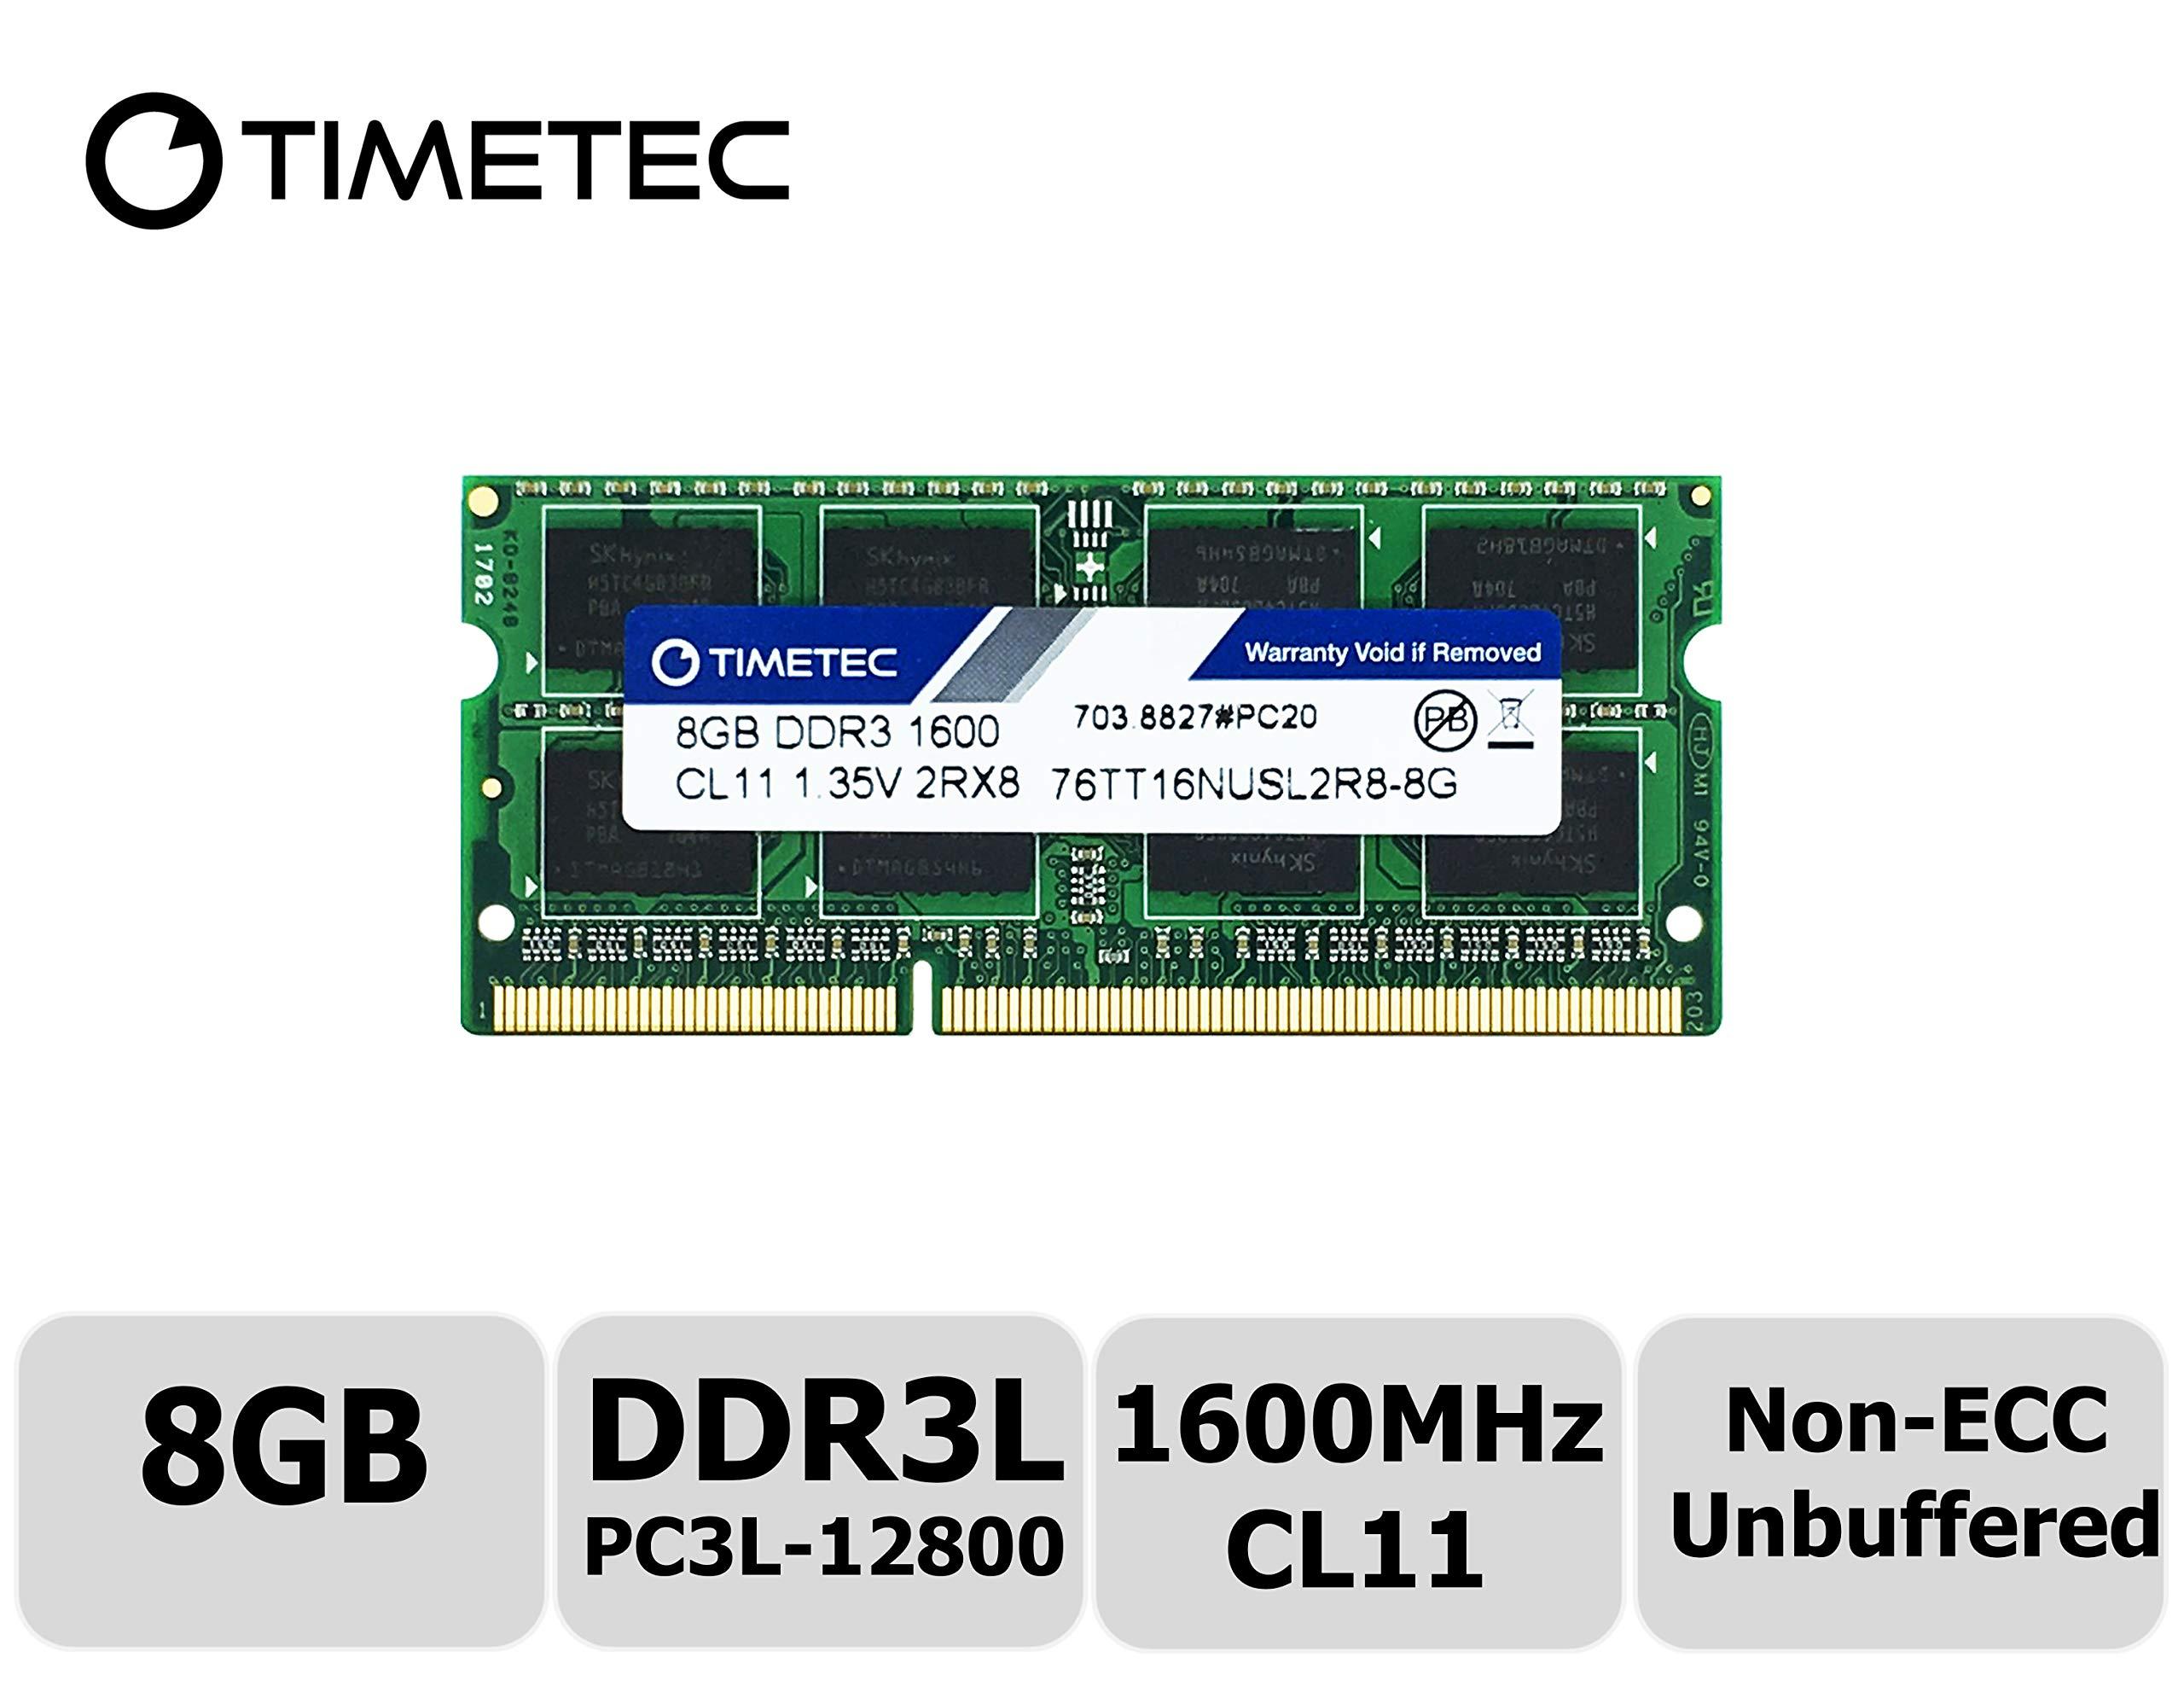 Timetec Hynix IC 8GB DDR3L 1600MHz PC3L-12800 Non ECC Unbuffered 1.35V CL11 2Rx8 Dual Rank 204 Pin SODIMM Laptop Notebook Computer Memory Ram Module Upgrade(8GB)